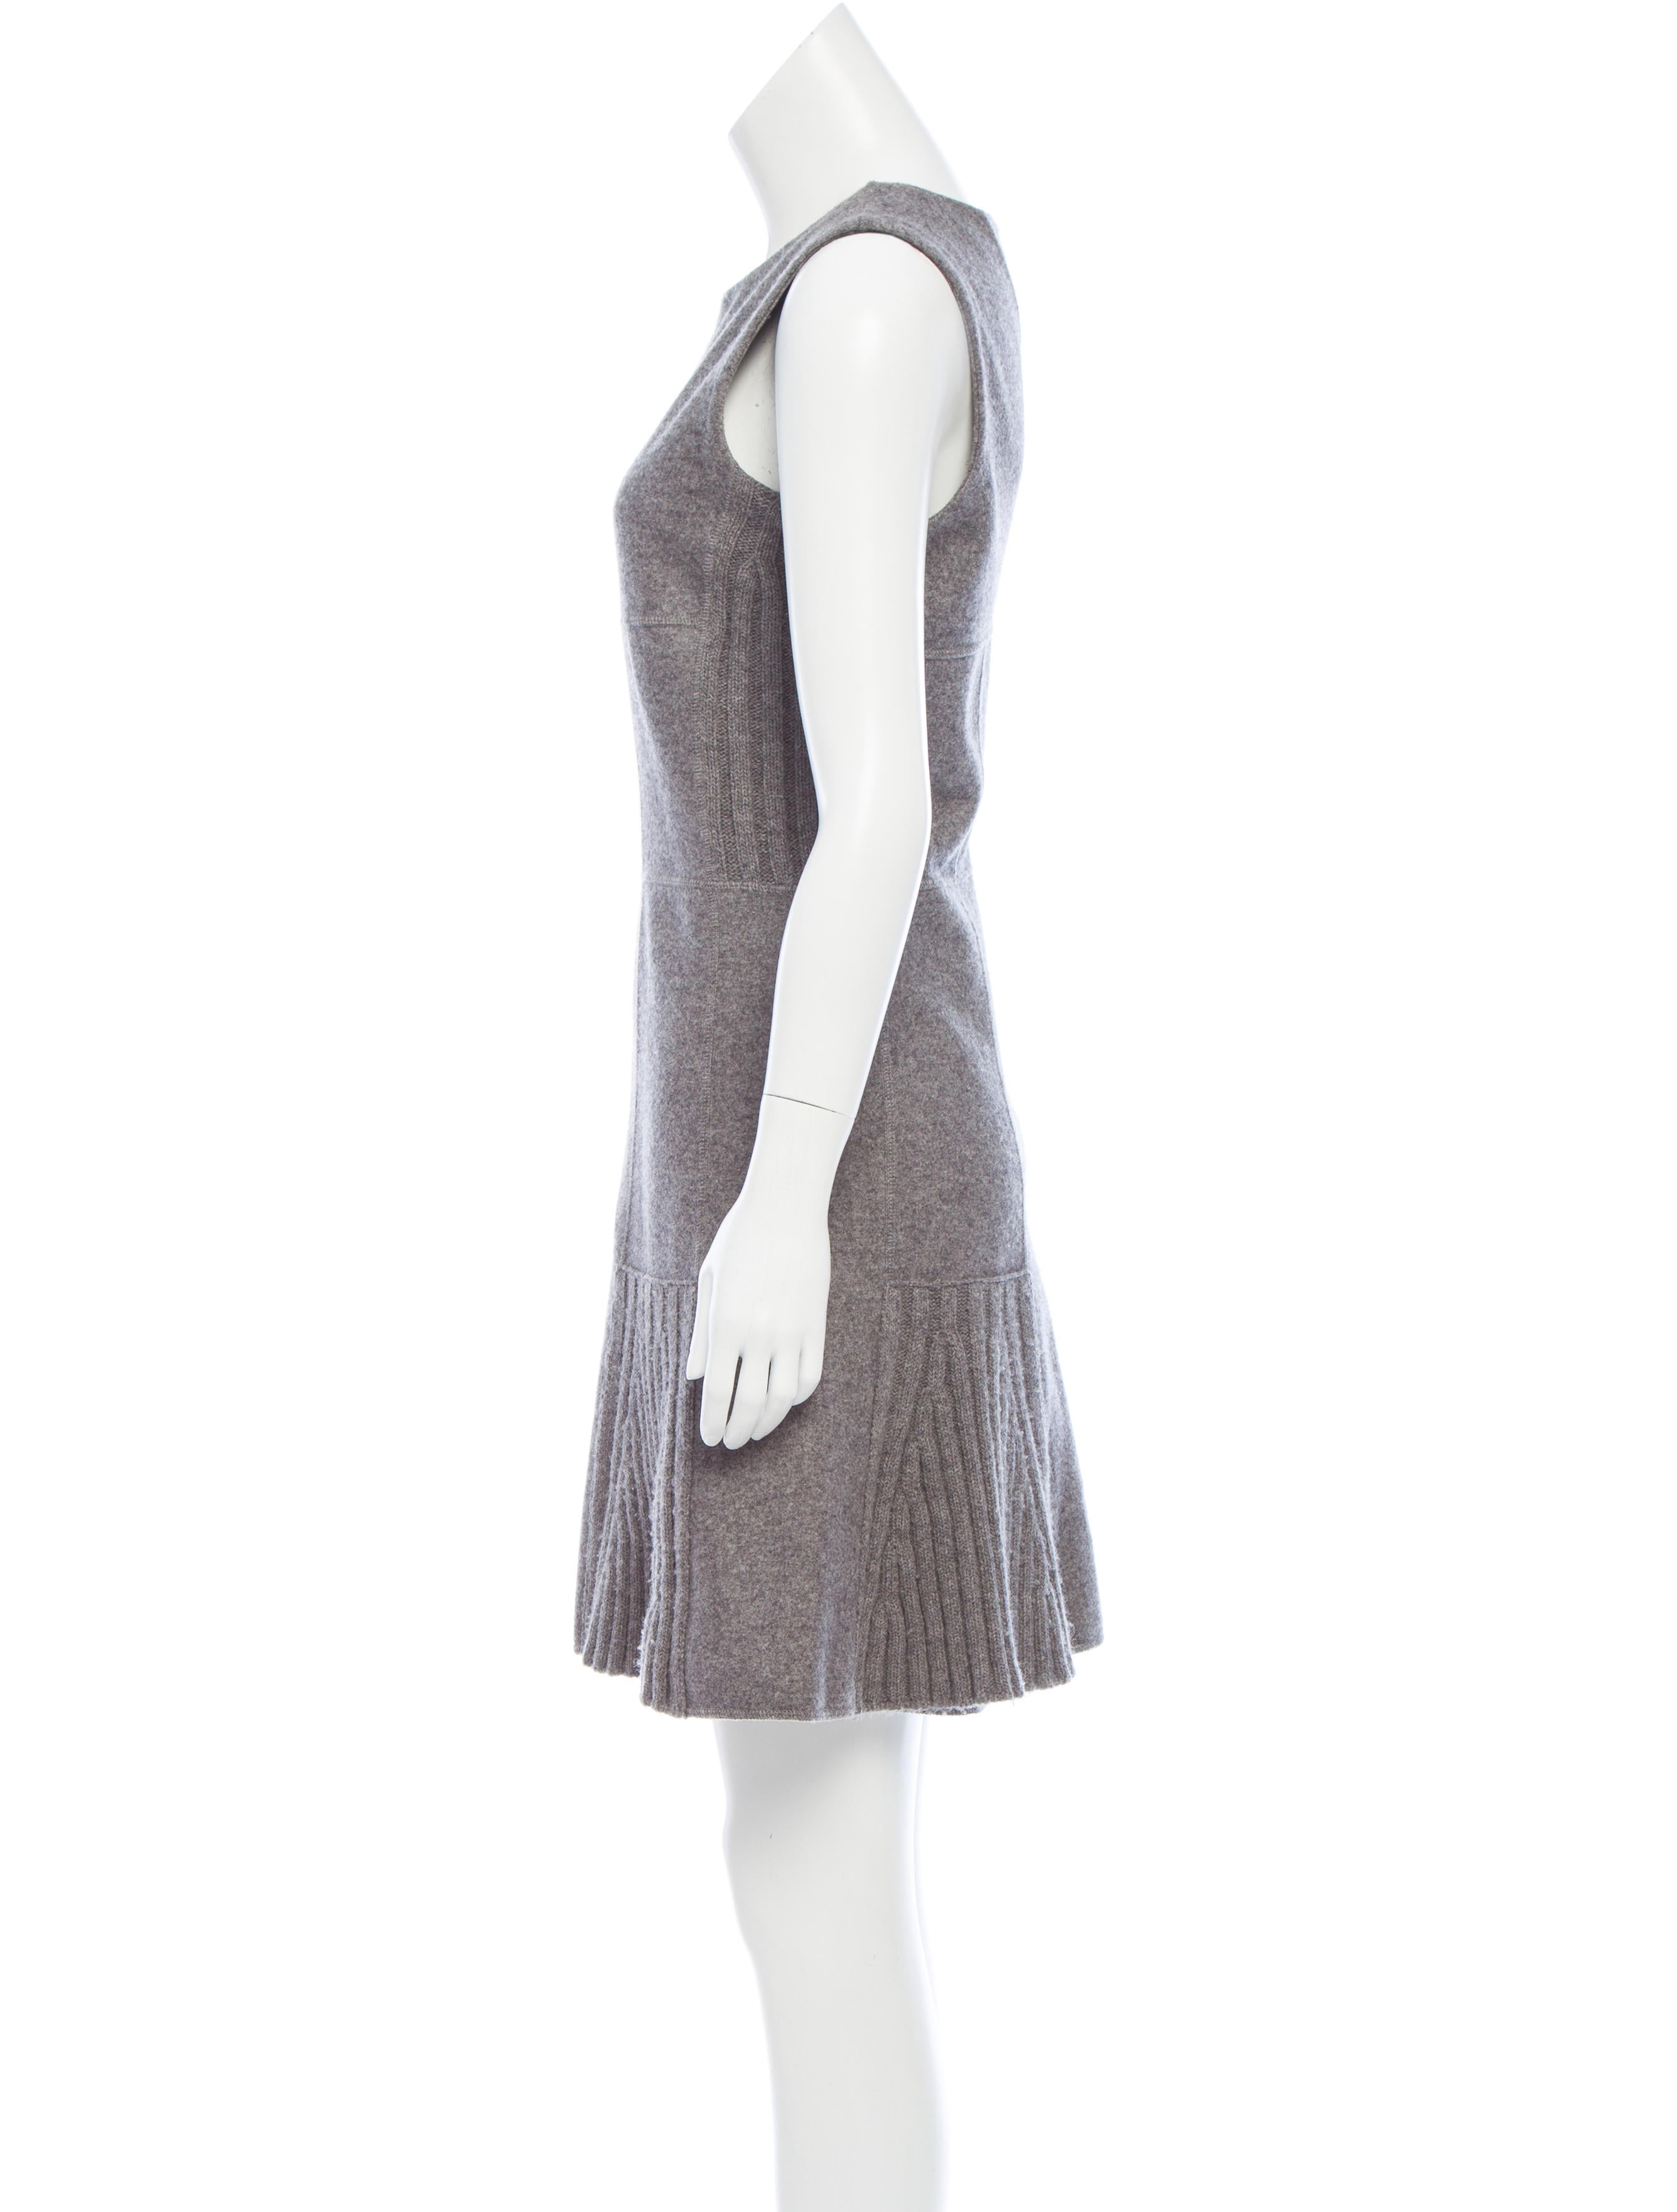 Oscar de la renta wool cashmere blend dress clothing for Oscar de la renta candles